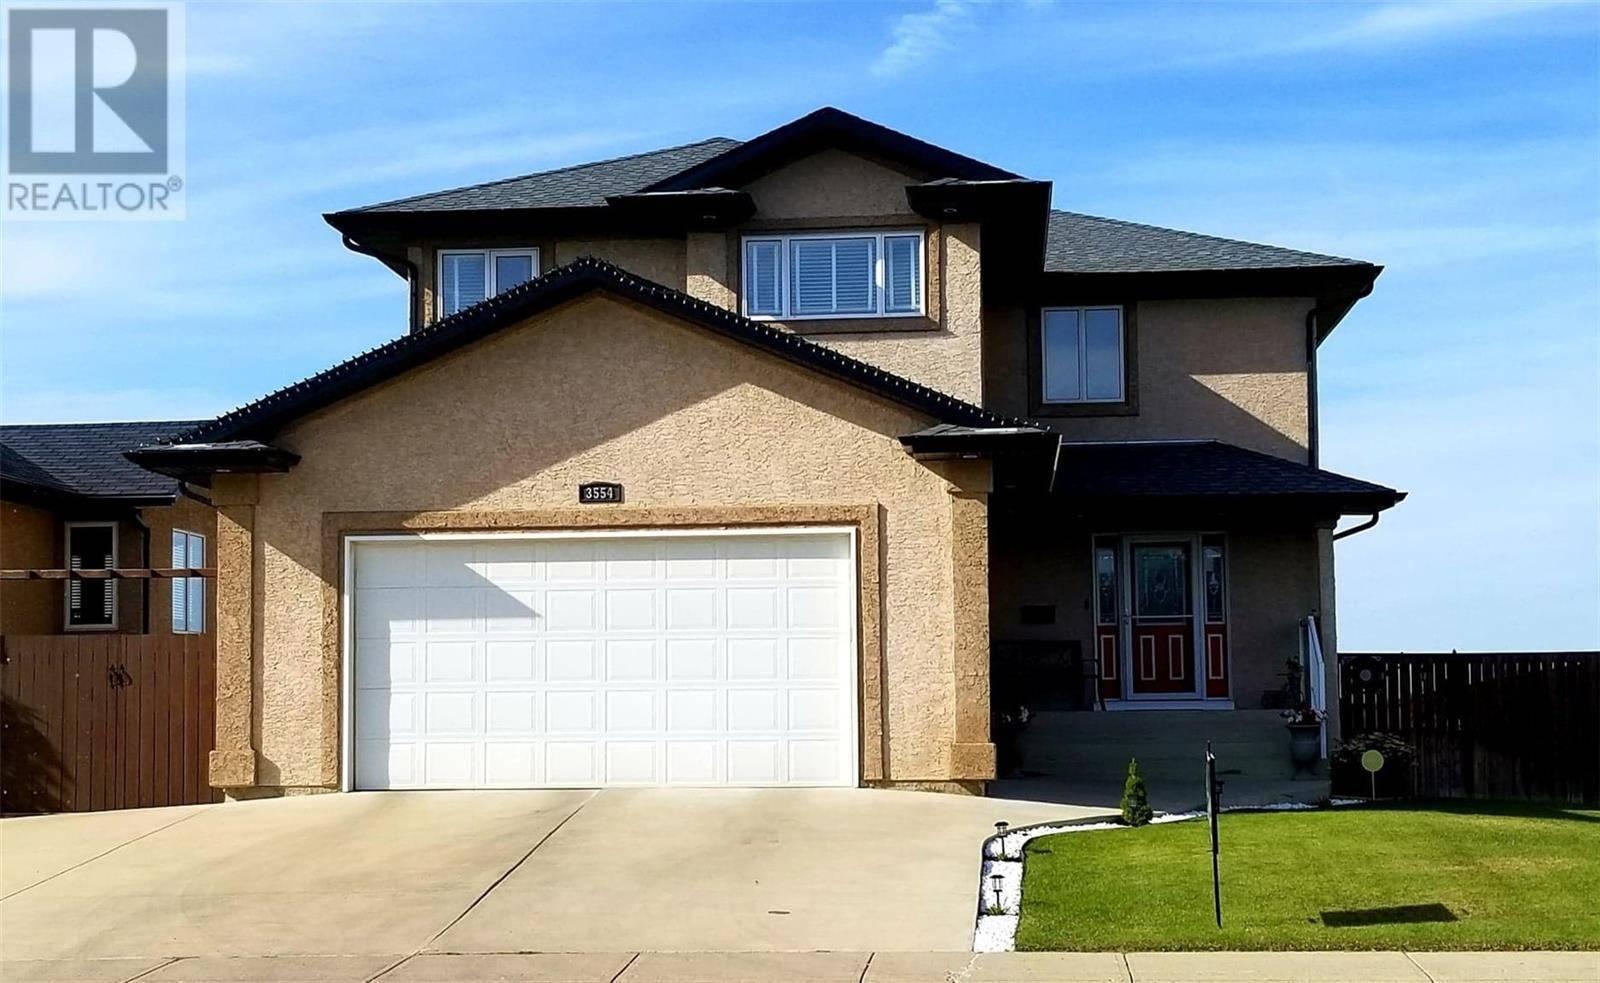 House for sale at 3554 37th St W Saskatoon Saskatchewan - MLS: SK778191